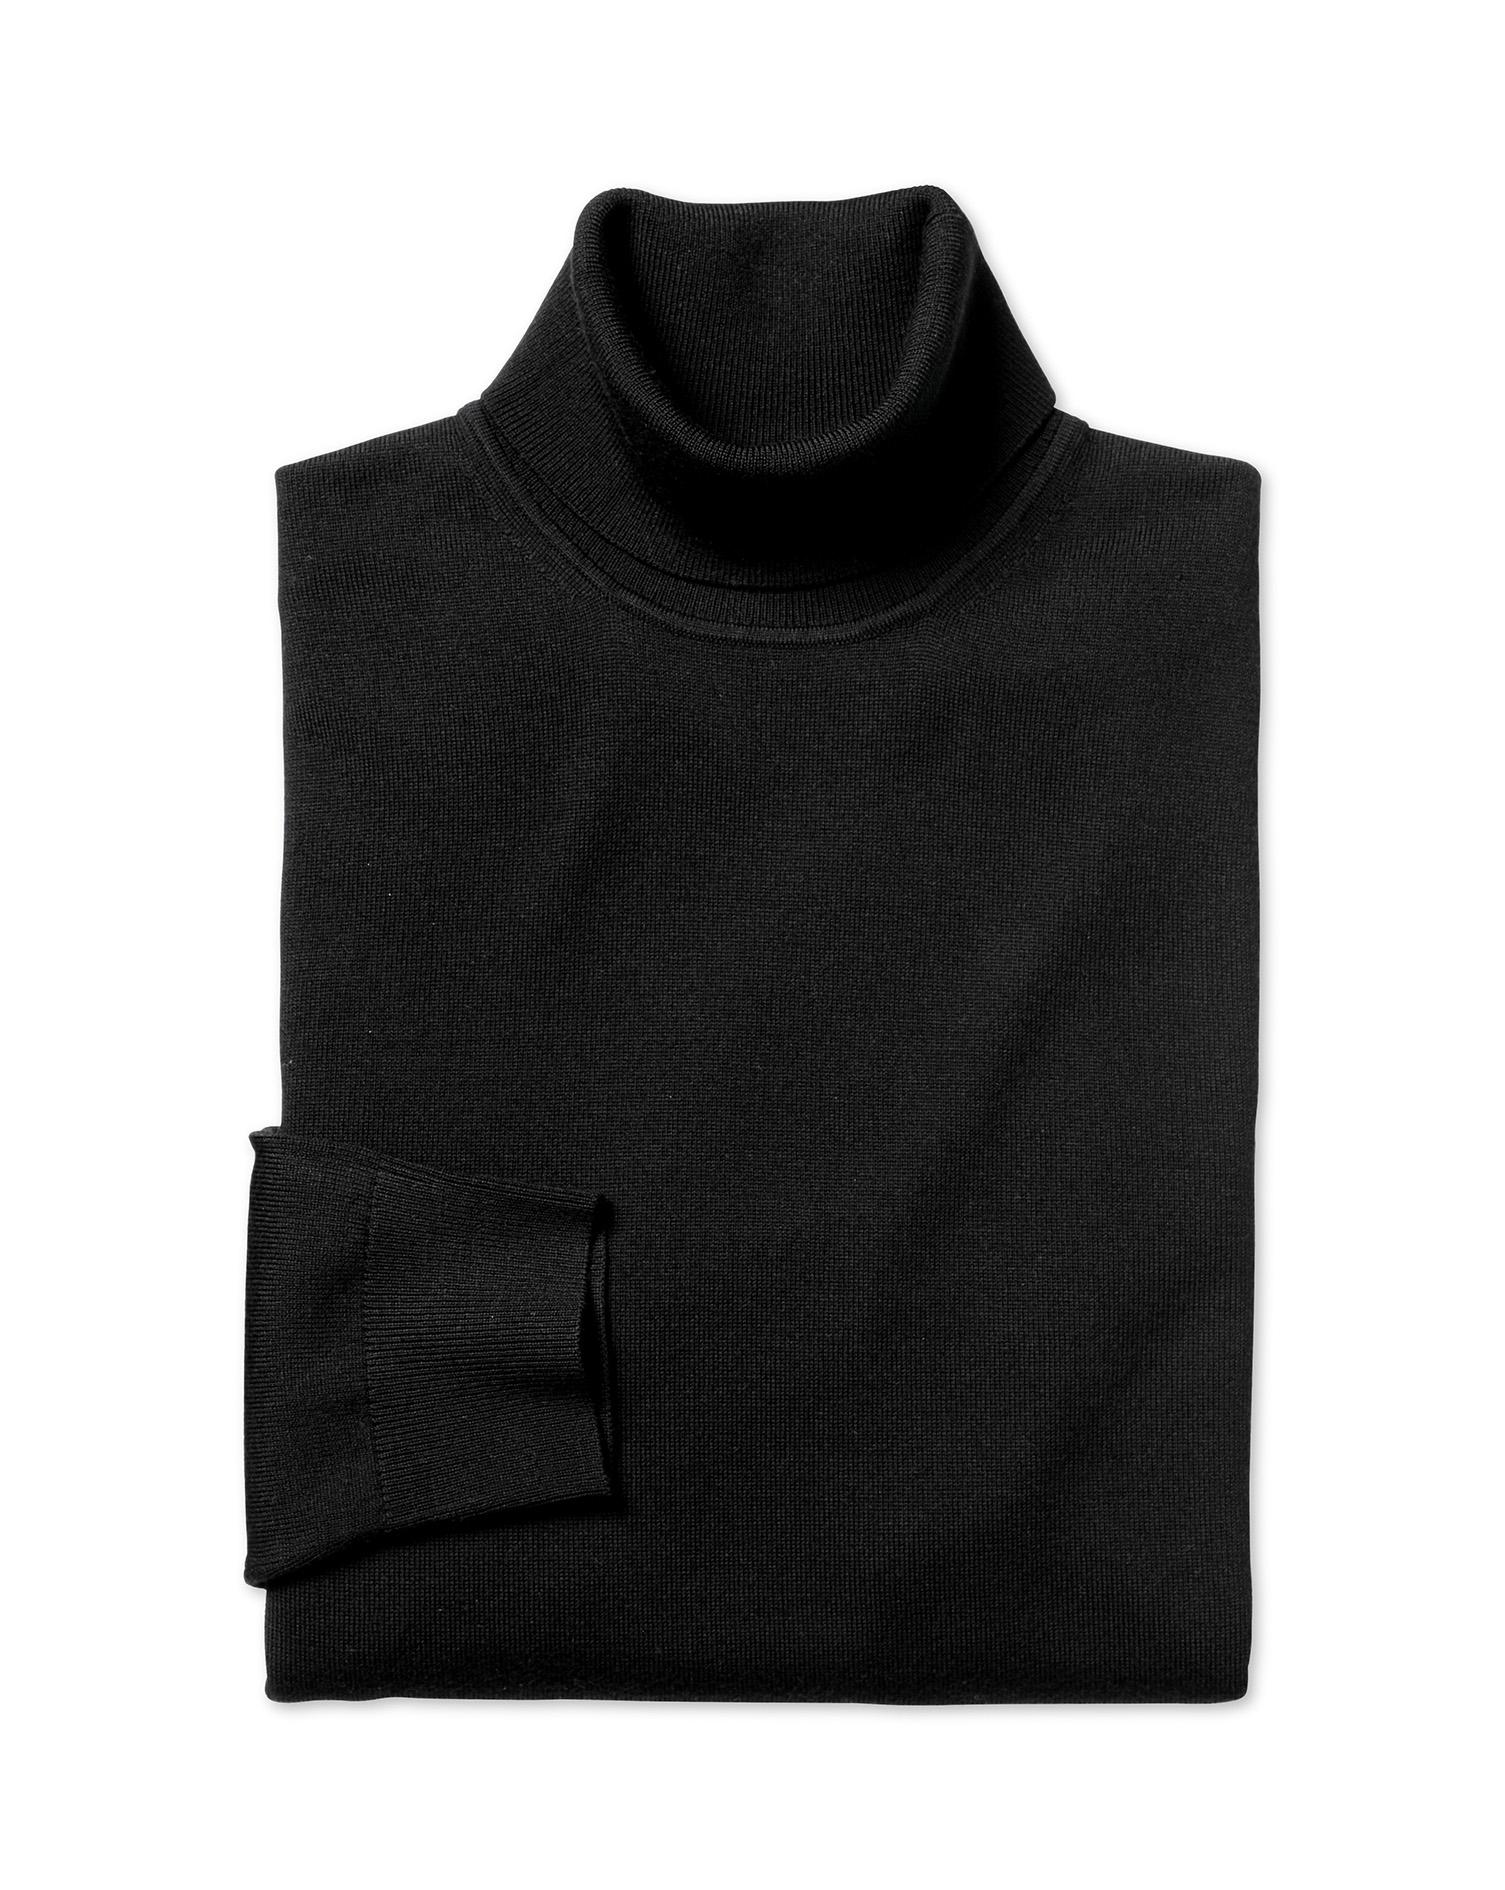 Black Merino Wool Roll Neck Jumper Size Small by Charles Tyrwhitt